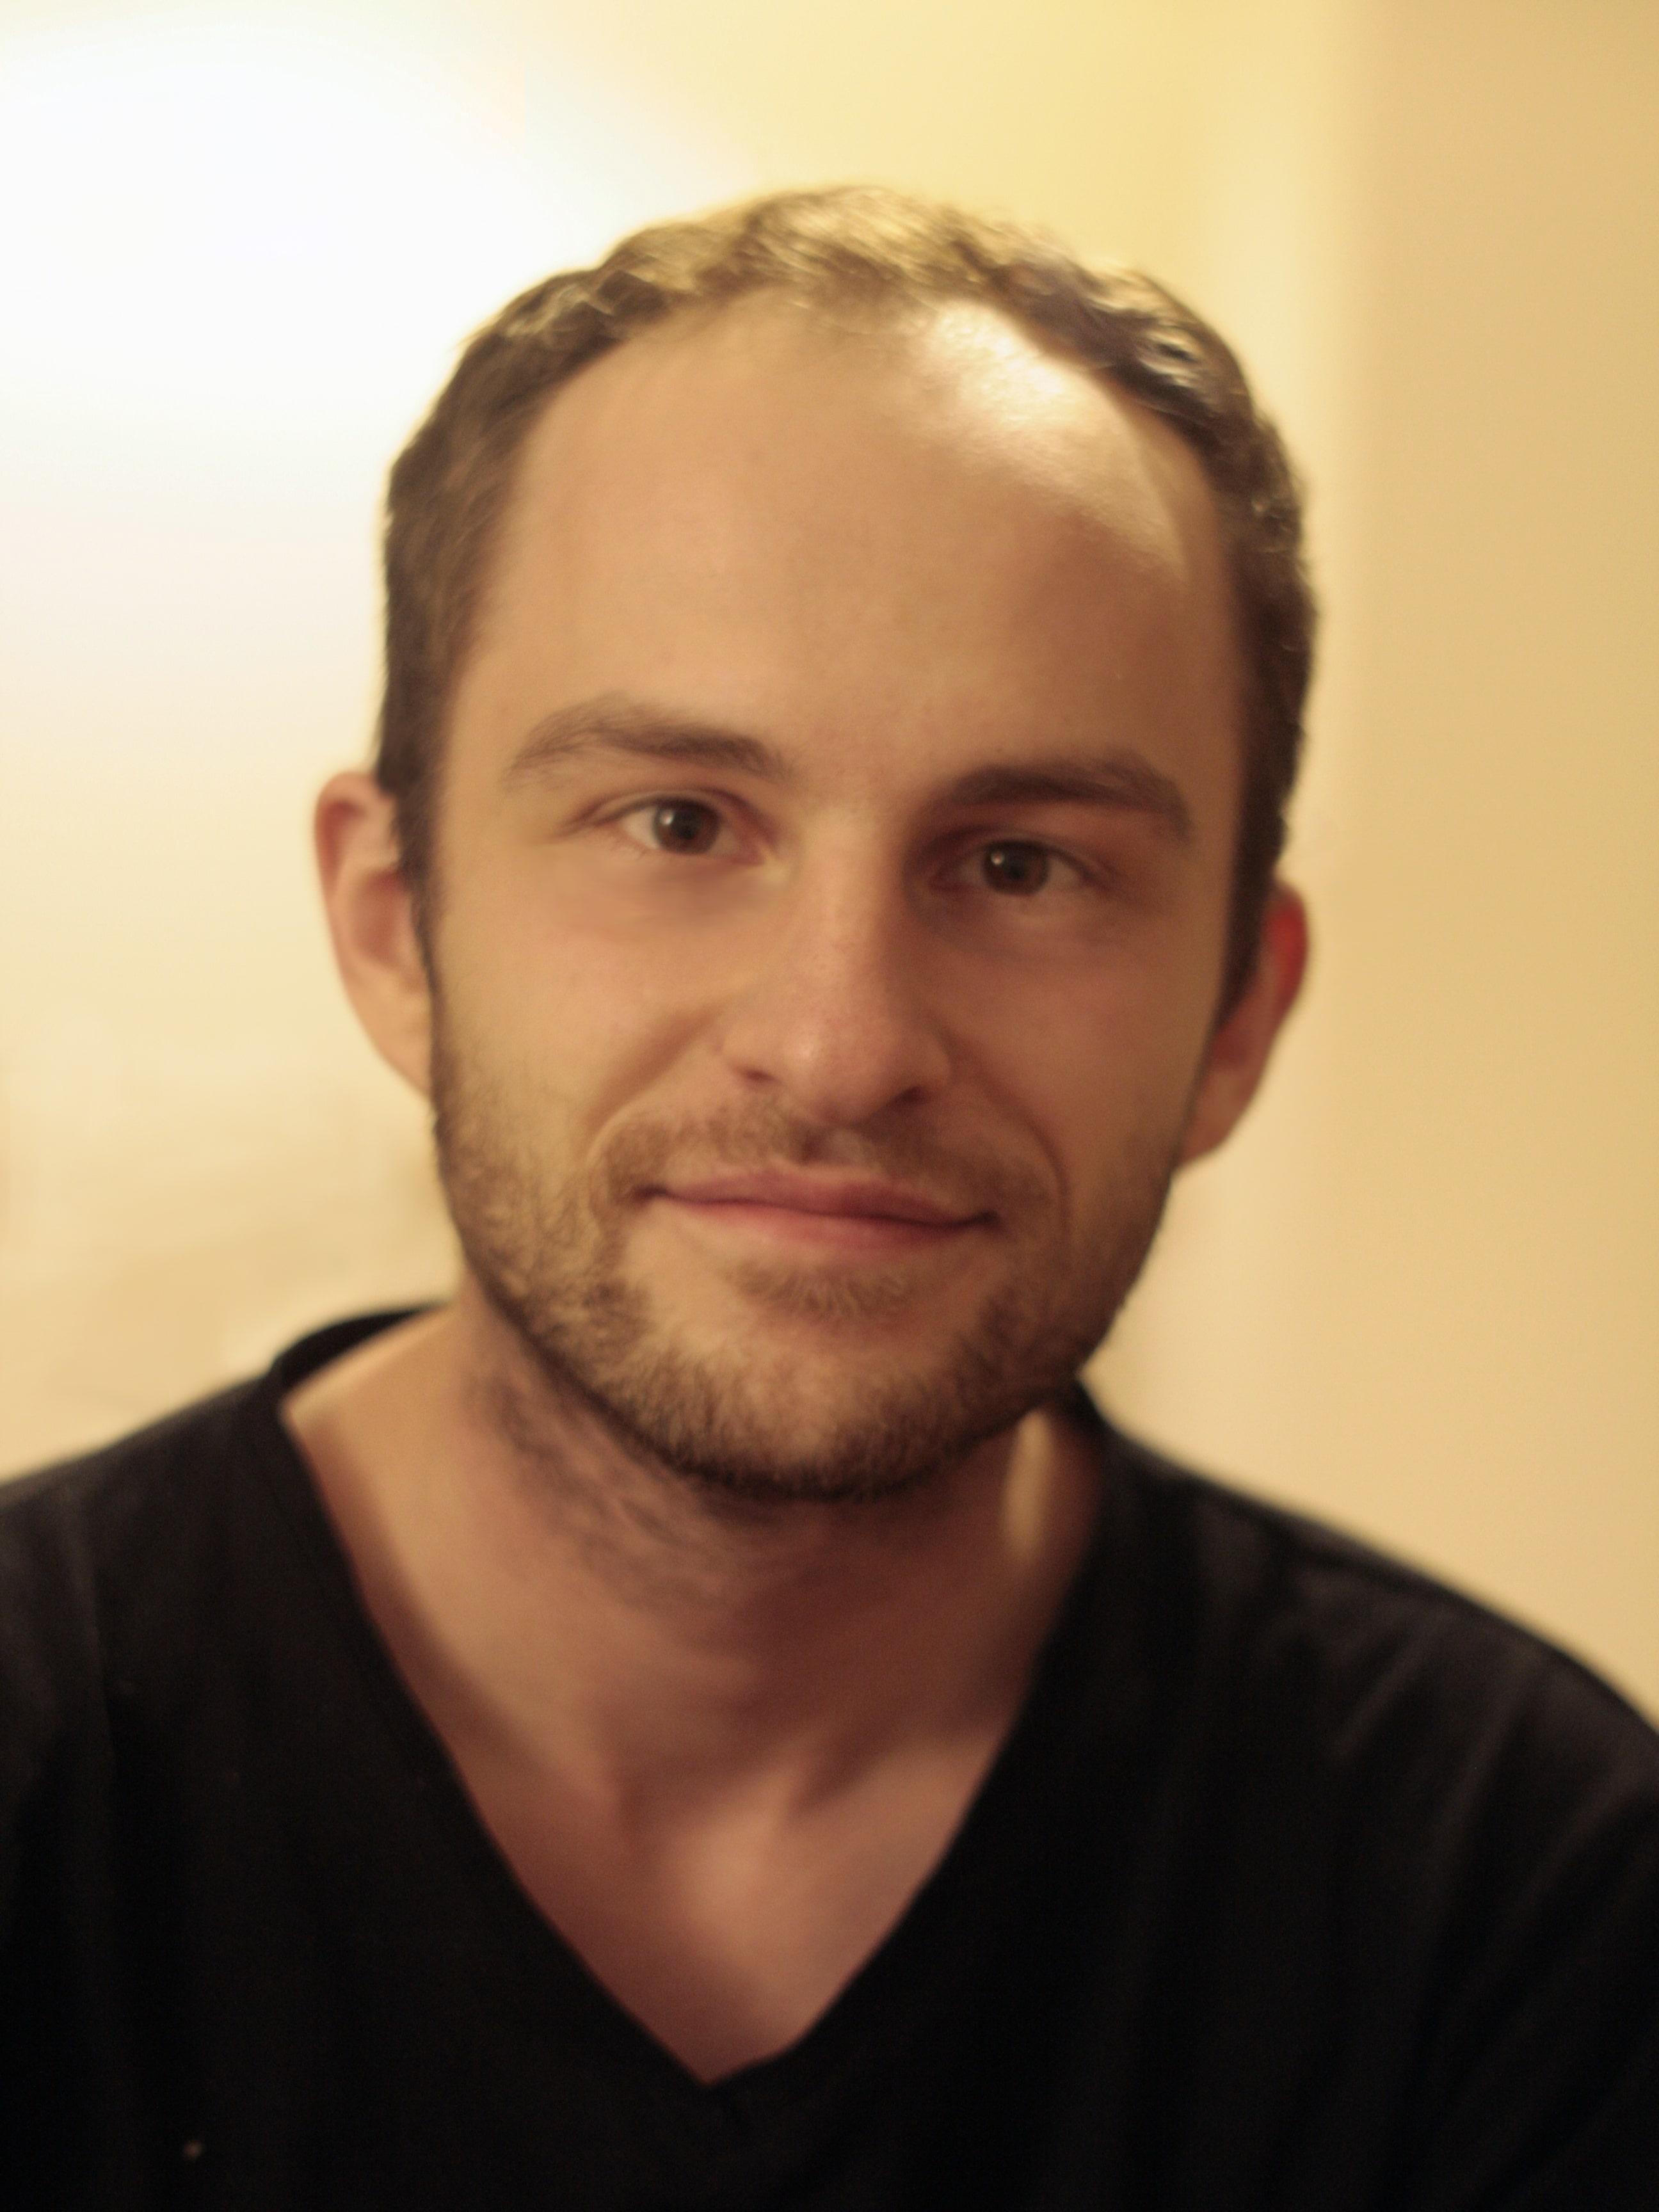 Nils Kraus